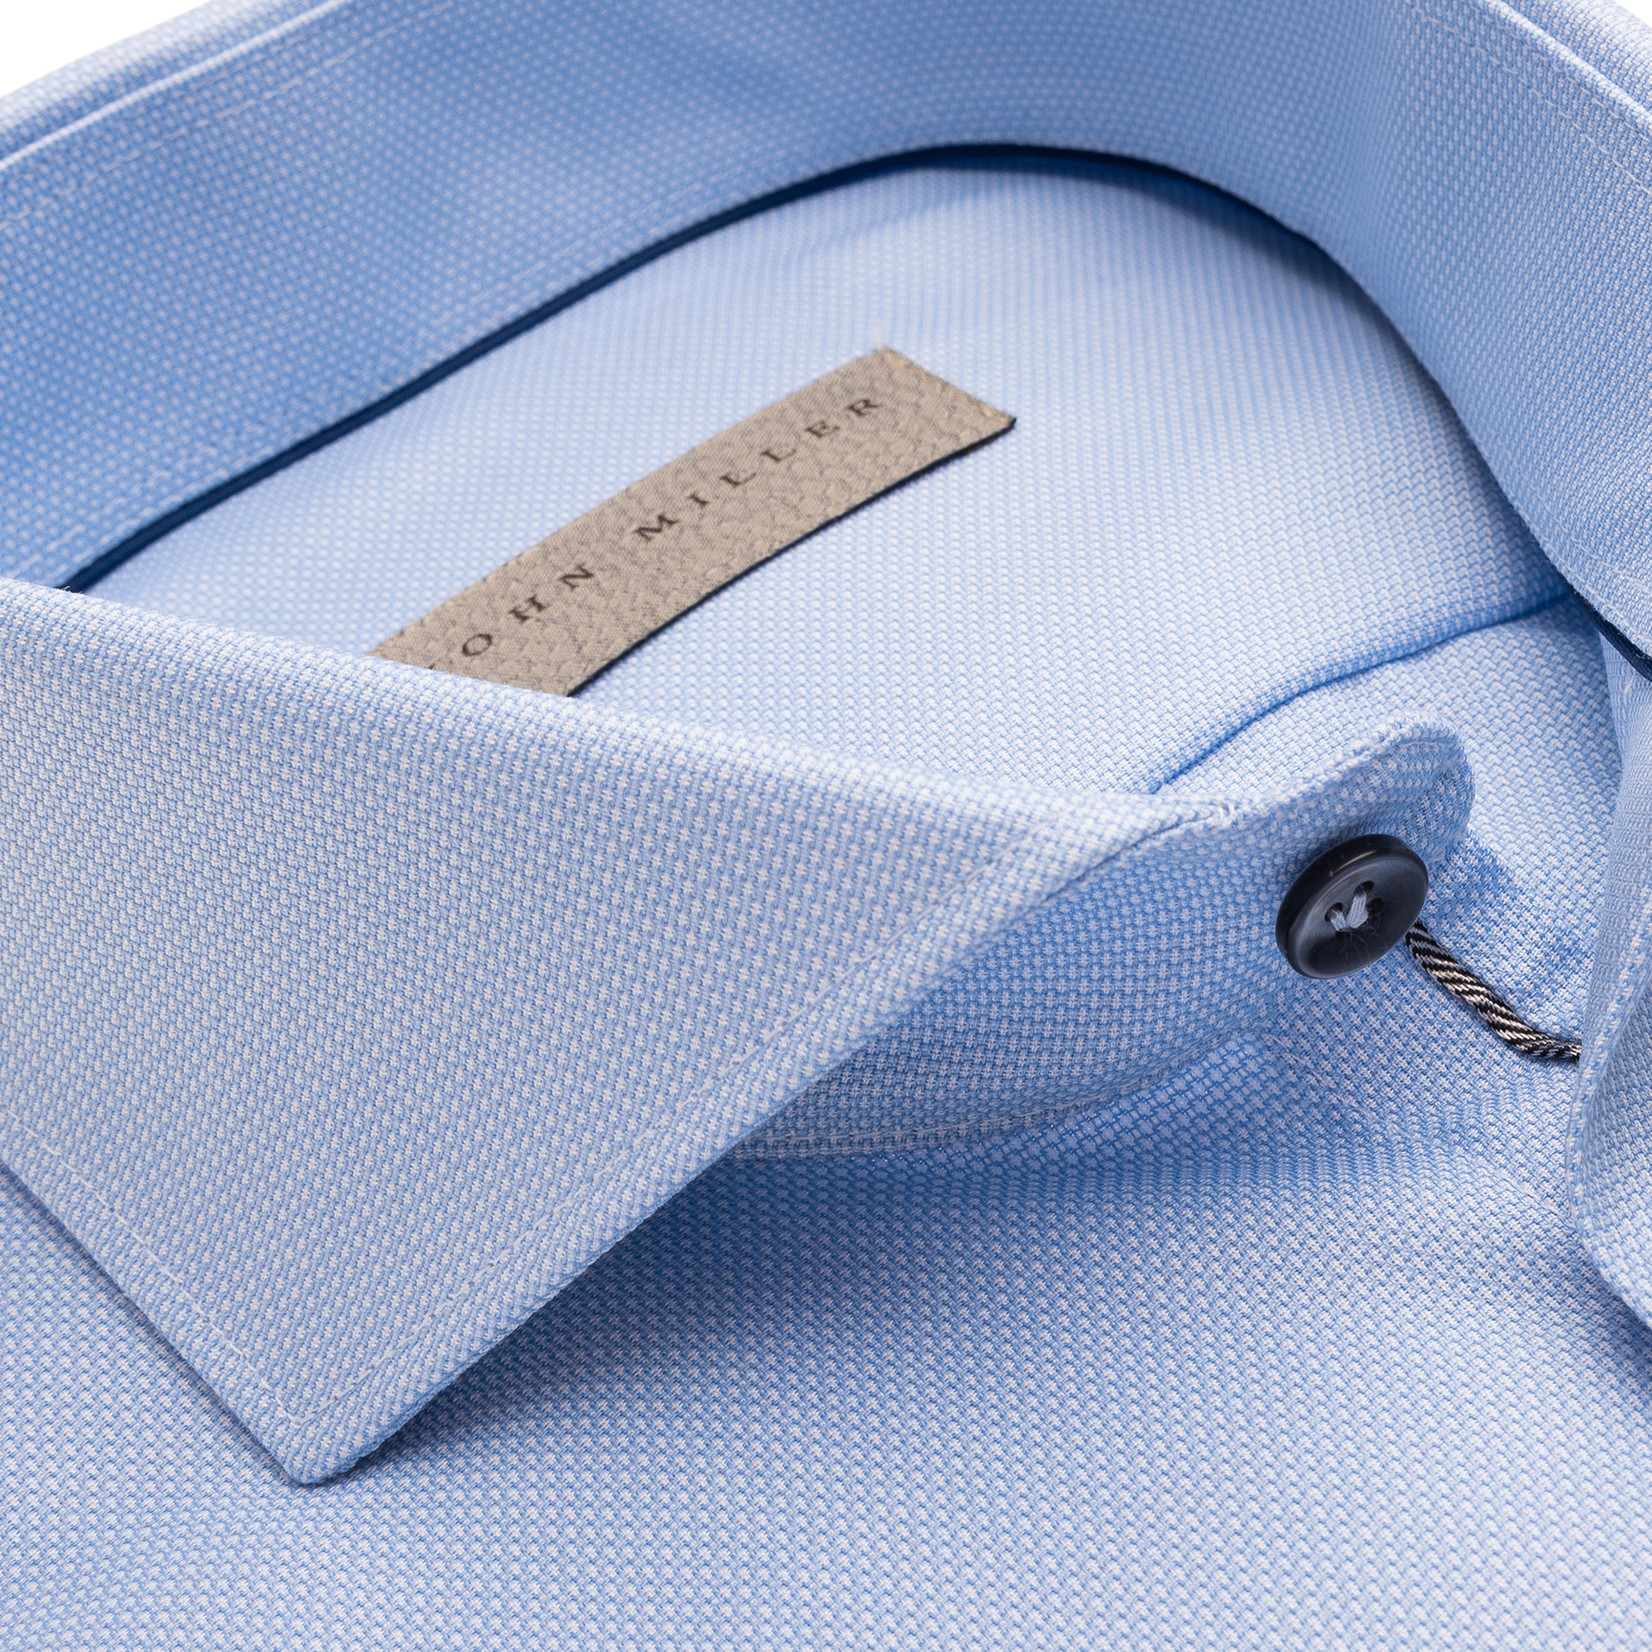 John Miller tailored fit overhemd lichtblauw met cut away boord